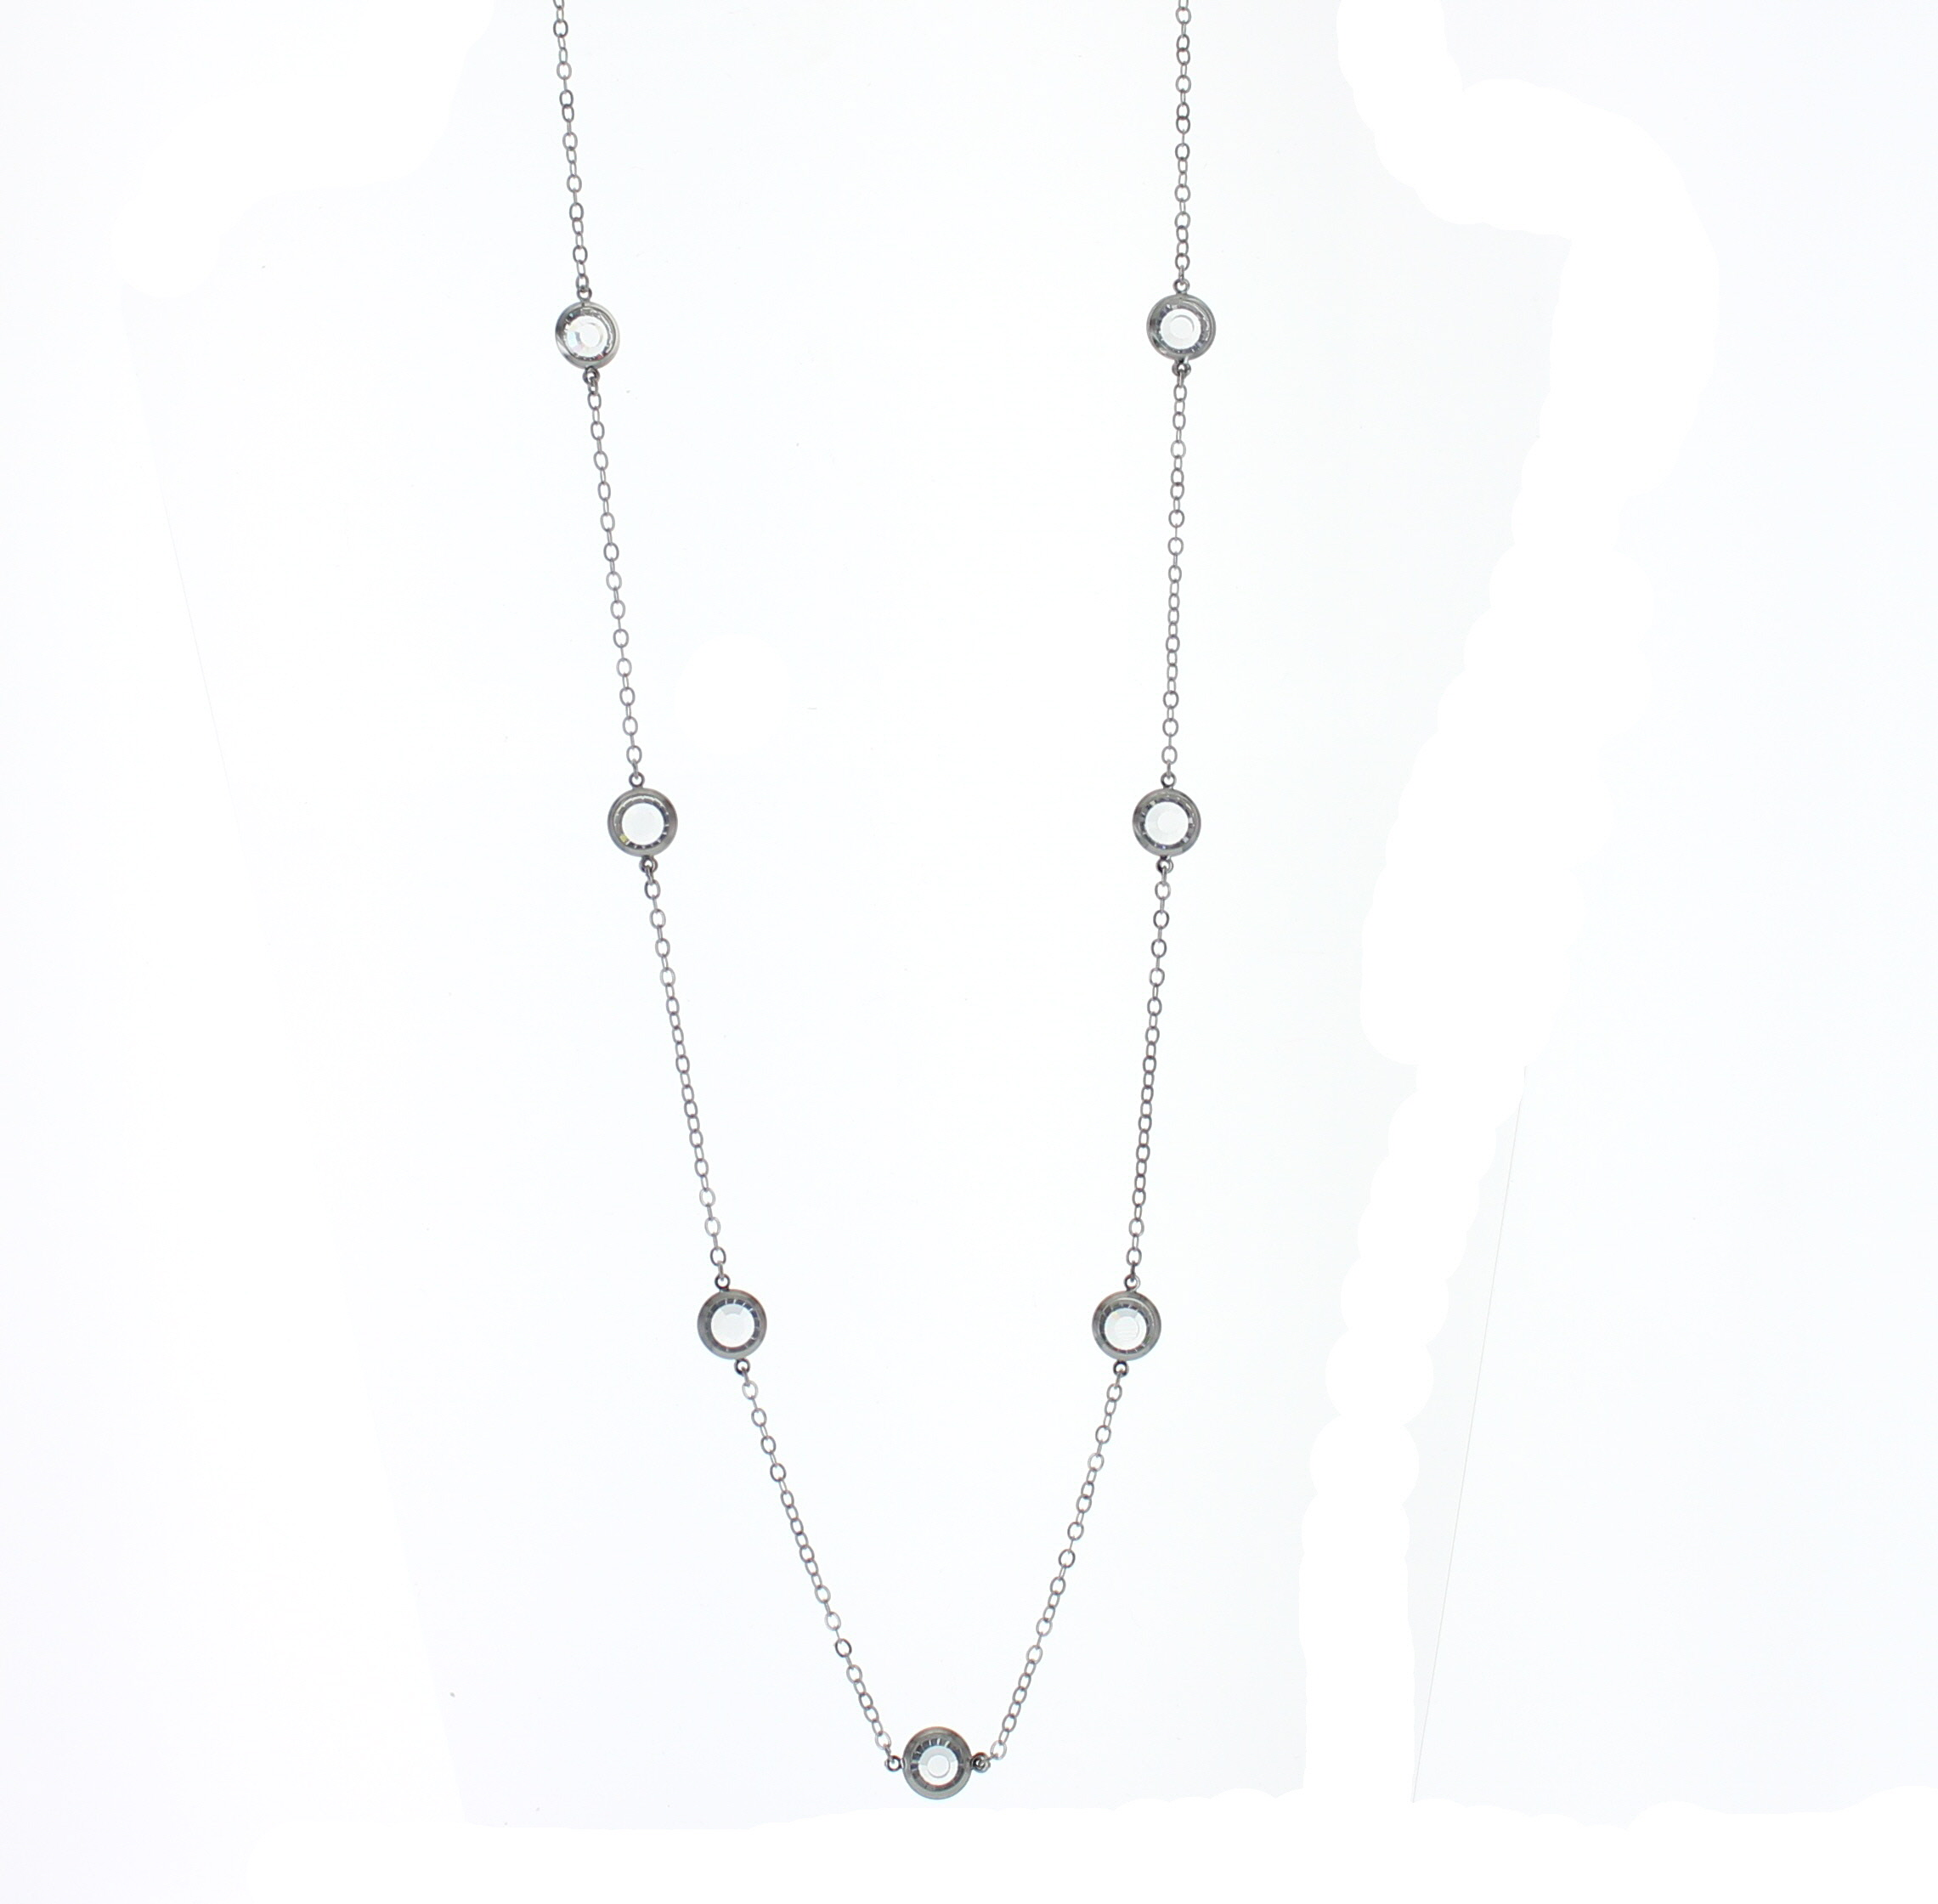 Online chain shopping